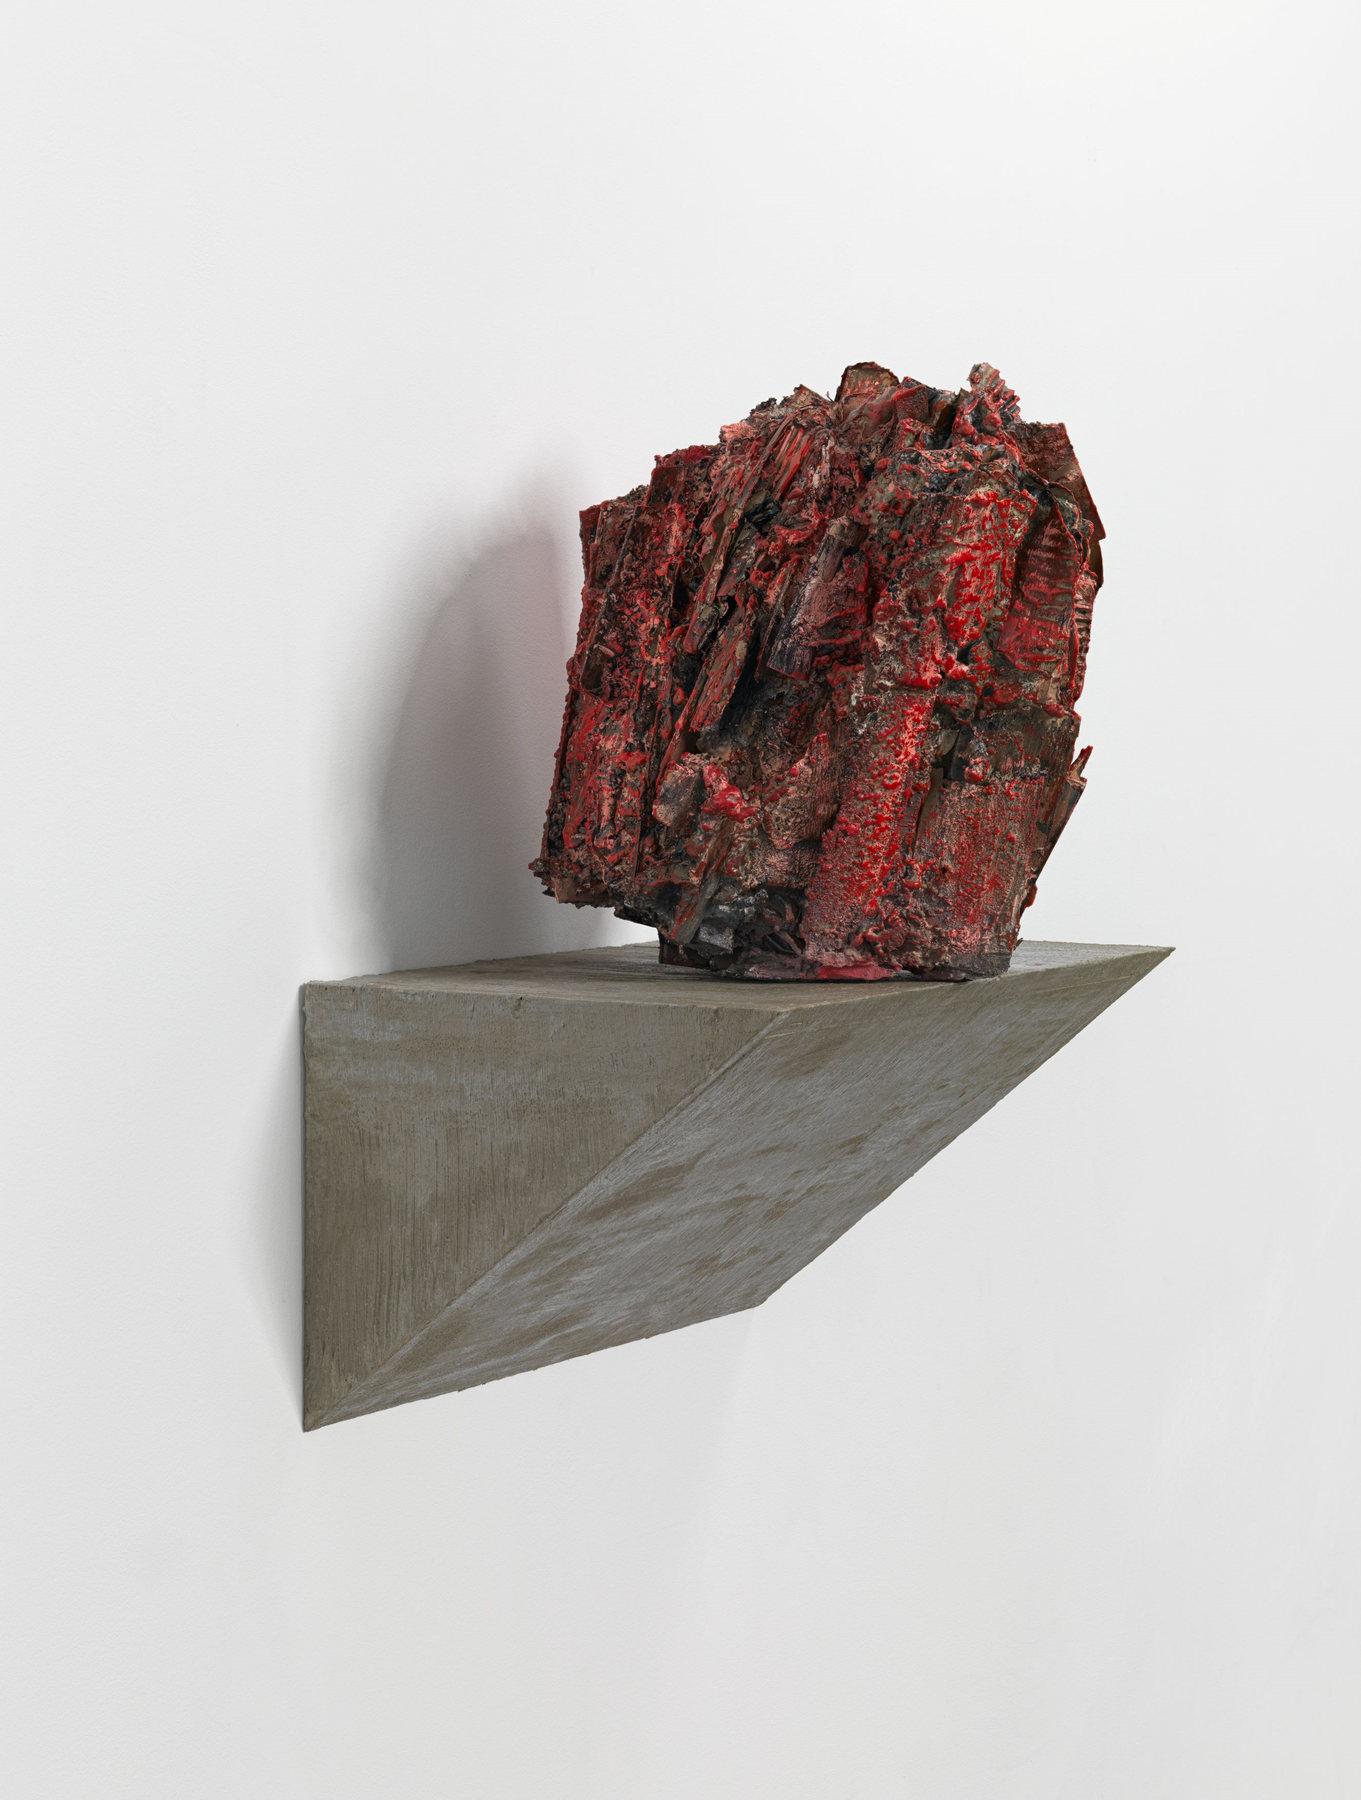 Phyllida Barlow at Hauser & Wirth – Art Viewer